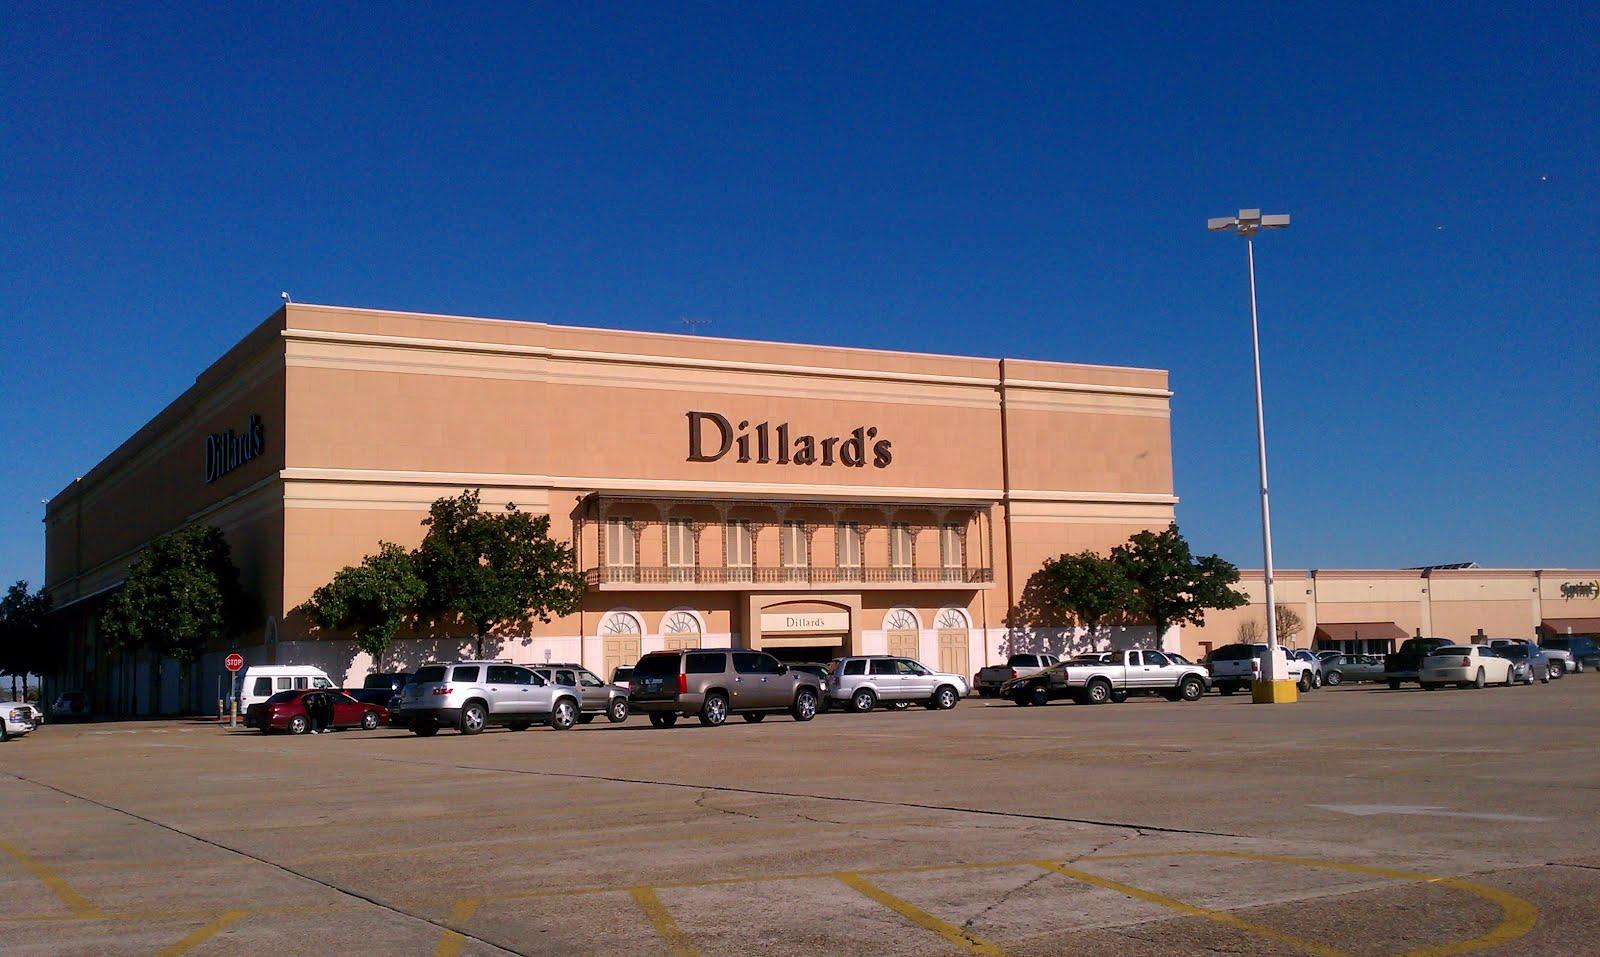 The Louisiana And Texas Retail Blogspot Southland Mall